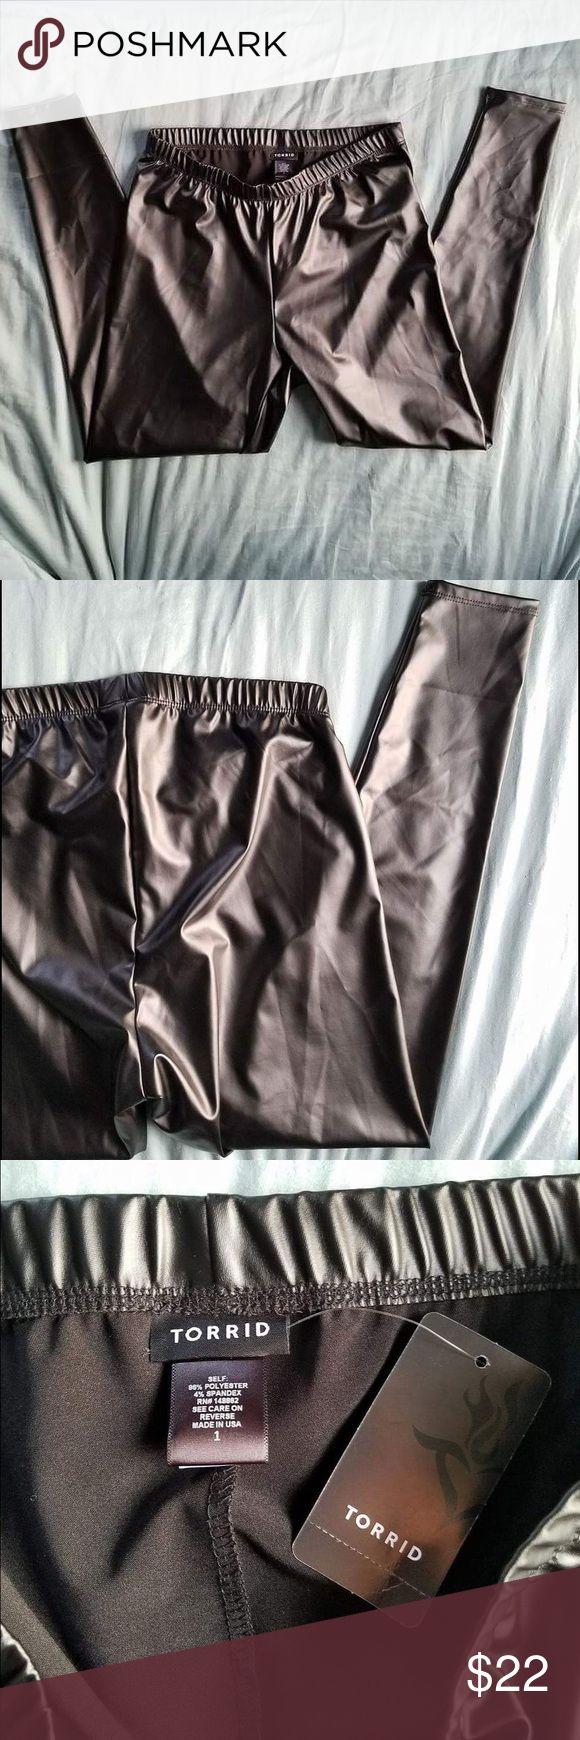 "Black wet look leggings Comfortable inside, sleek wet look on the outside. Torrid size ""1"" translates to XL torrid Pants Leggings"